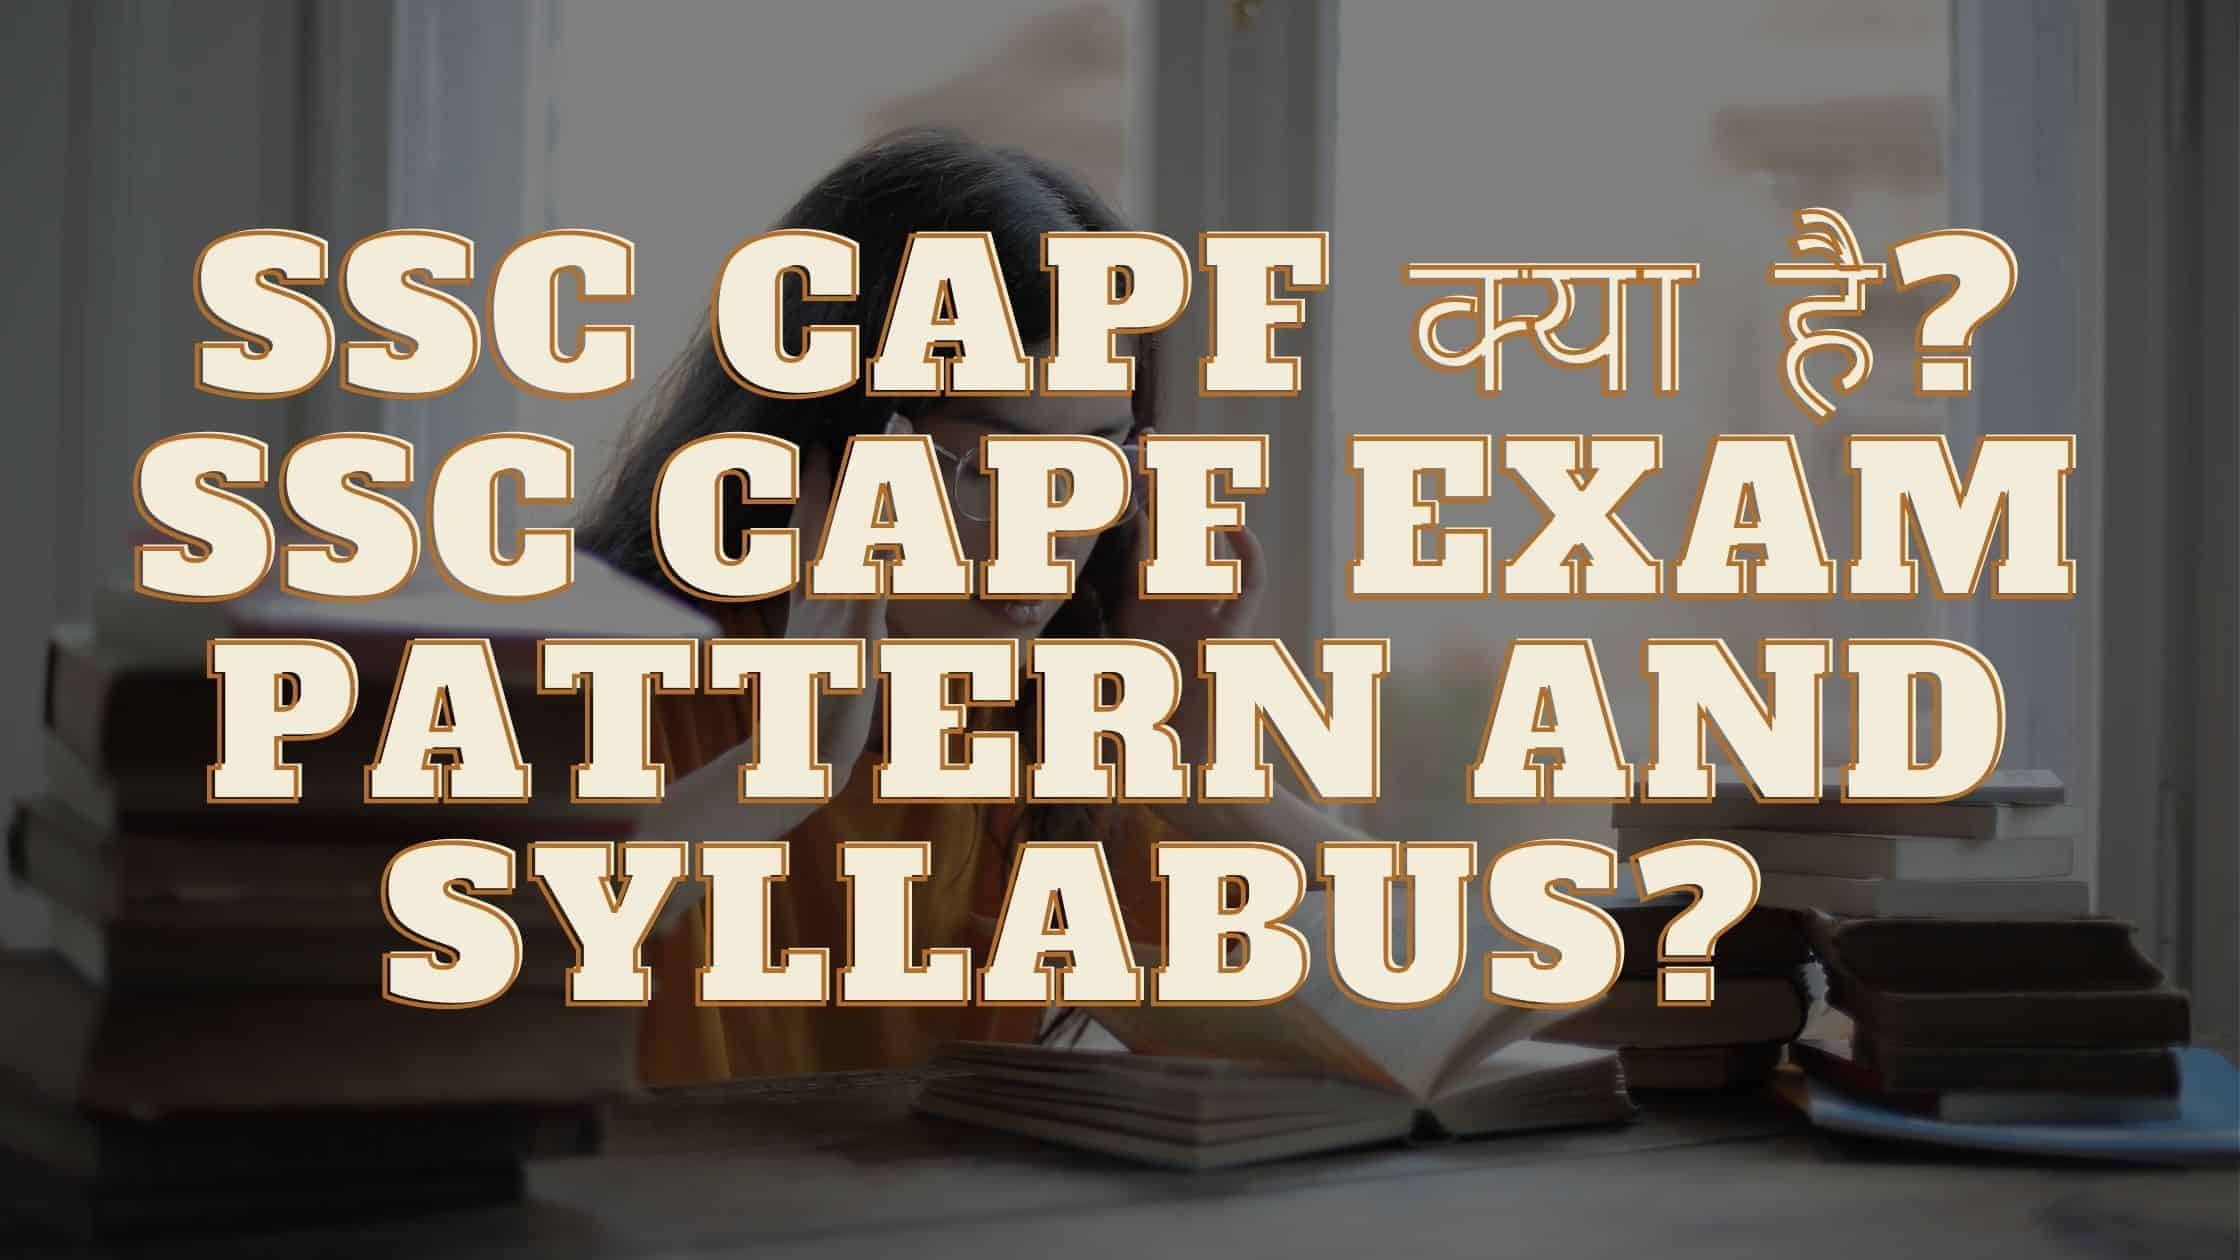 SSC CAPF क्या है? SSC CAPF Exam Pattern And Syllabus?